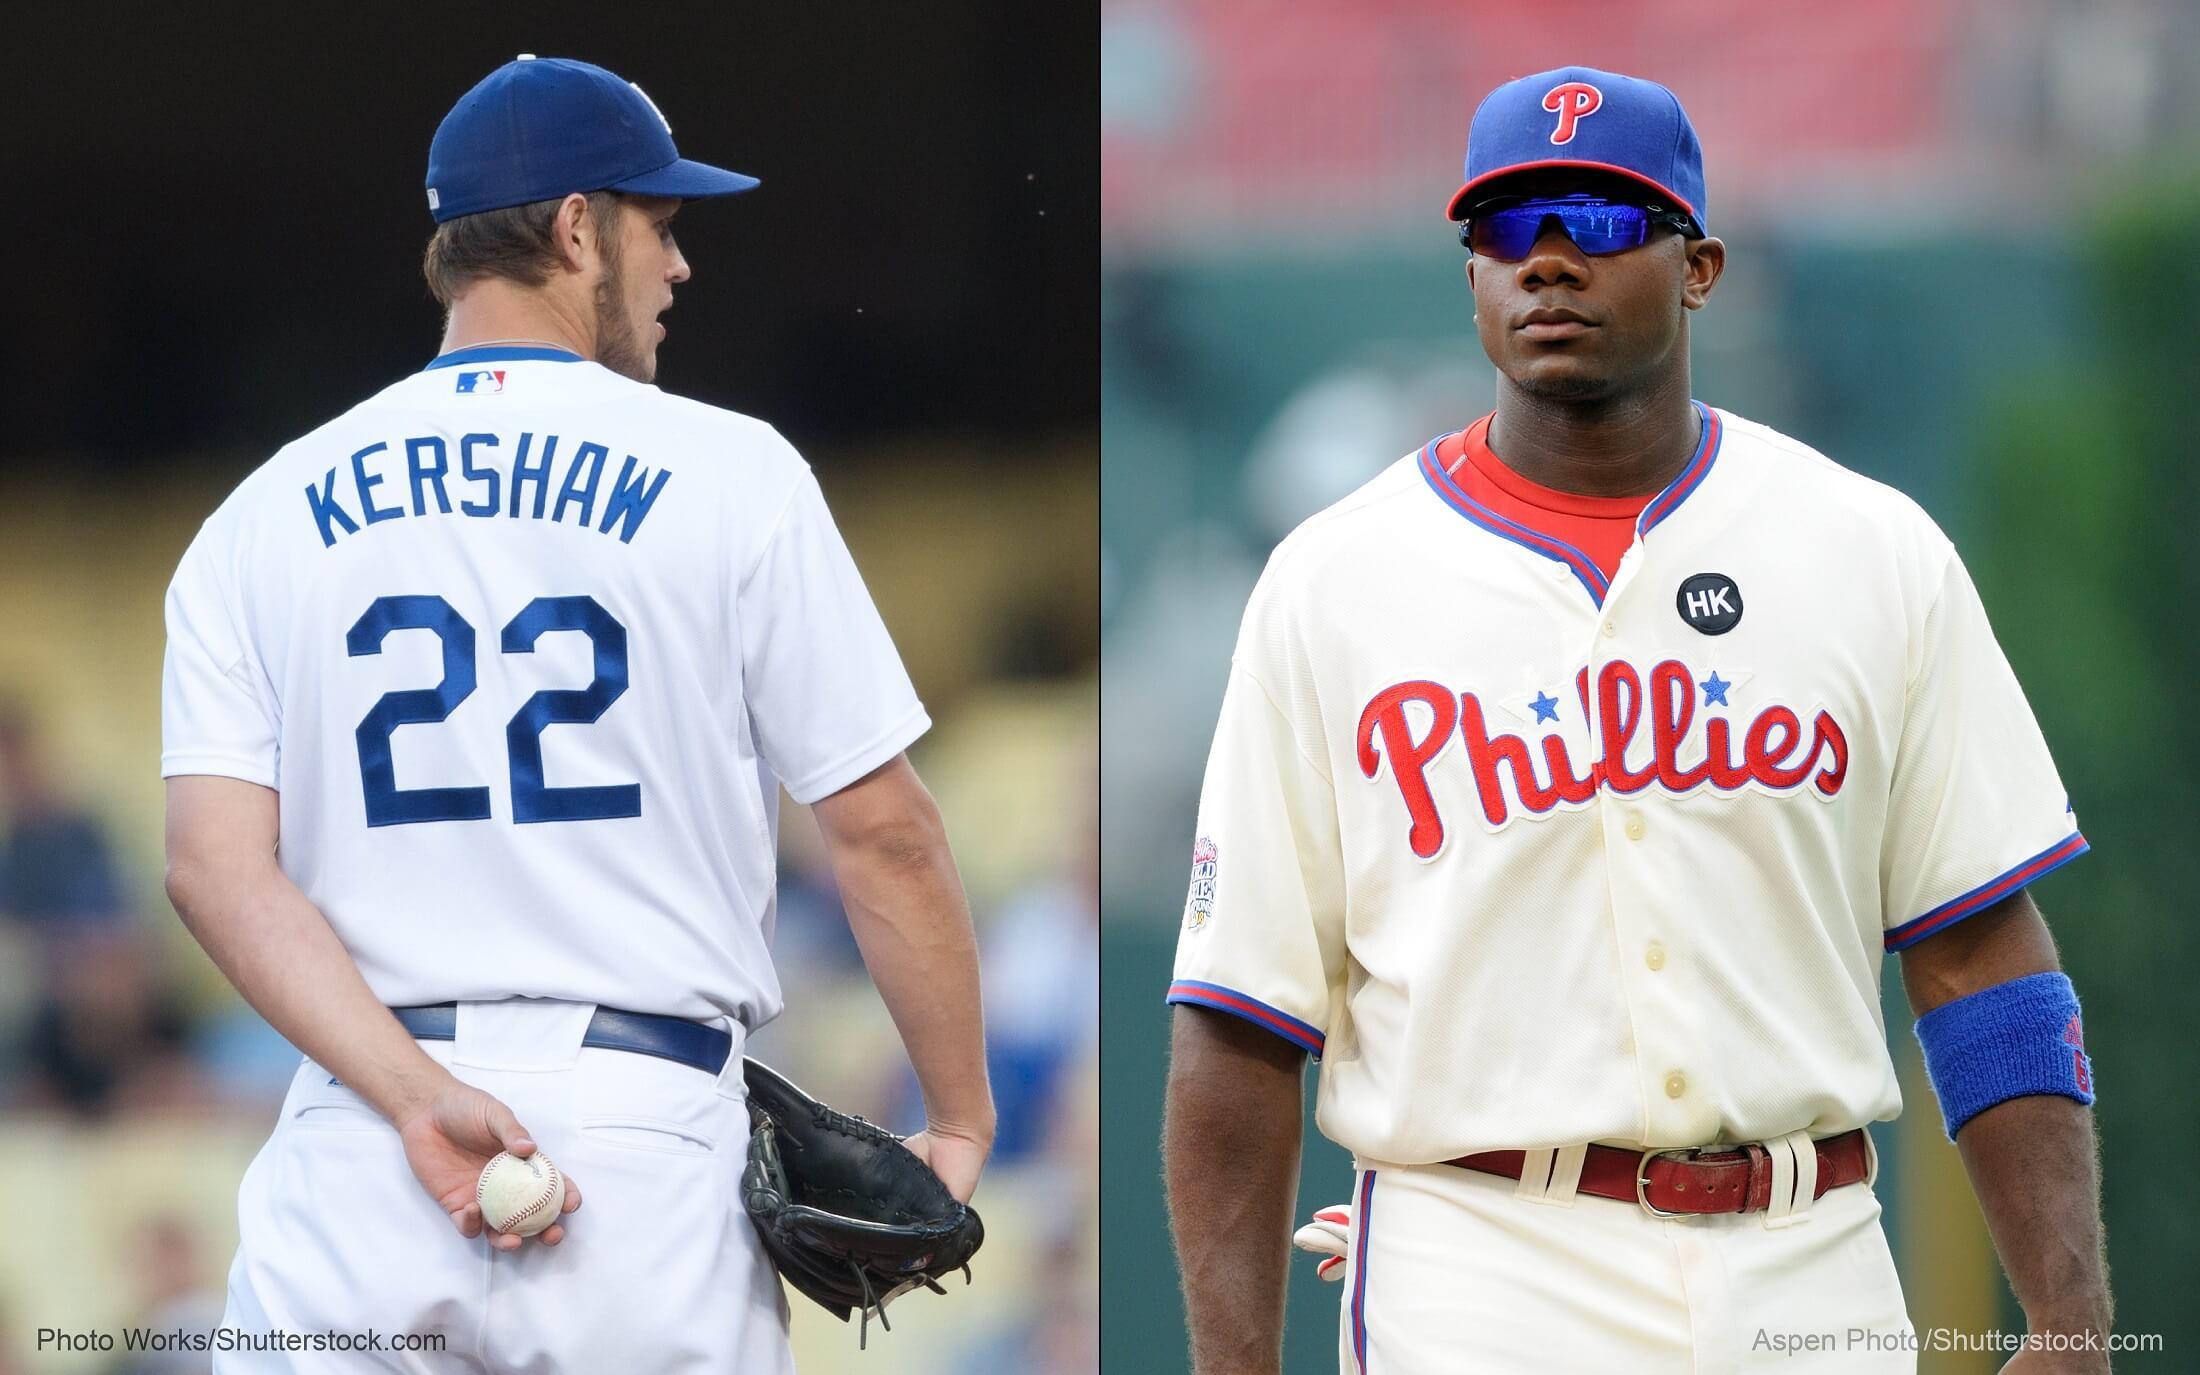 Highest-paid baseball players